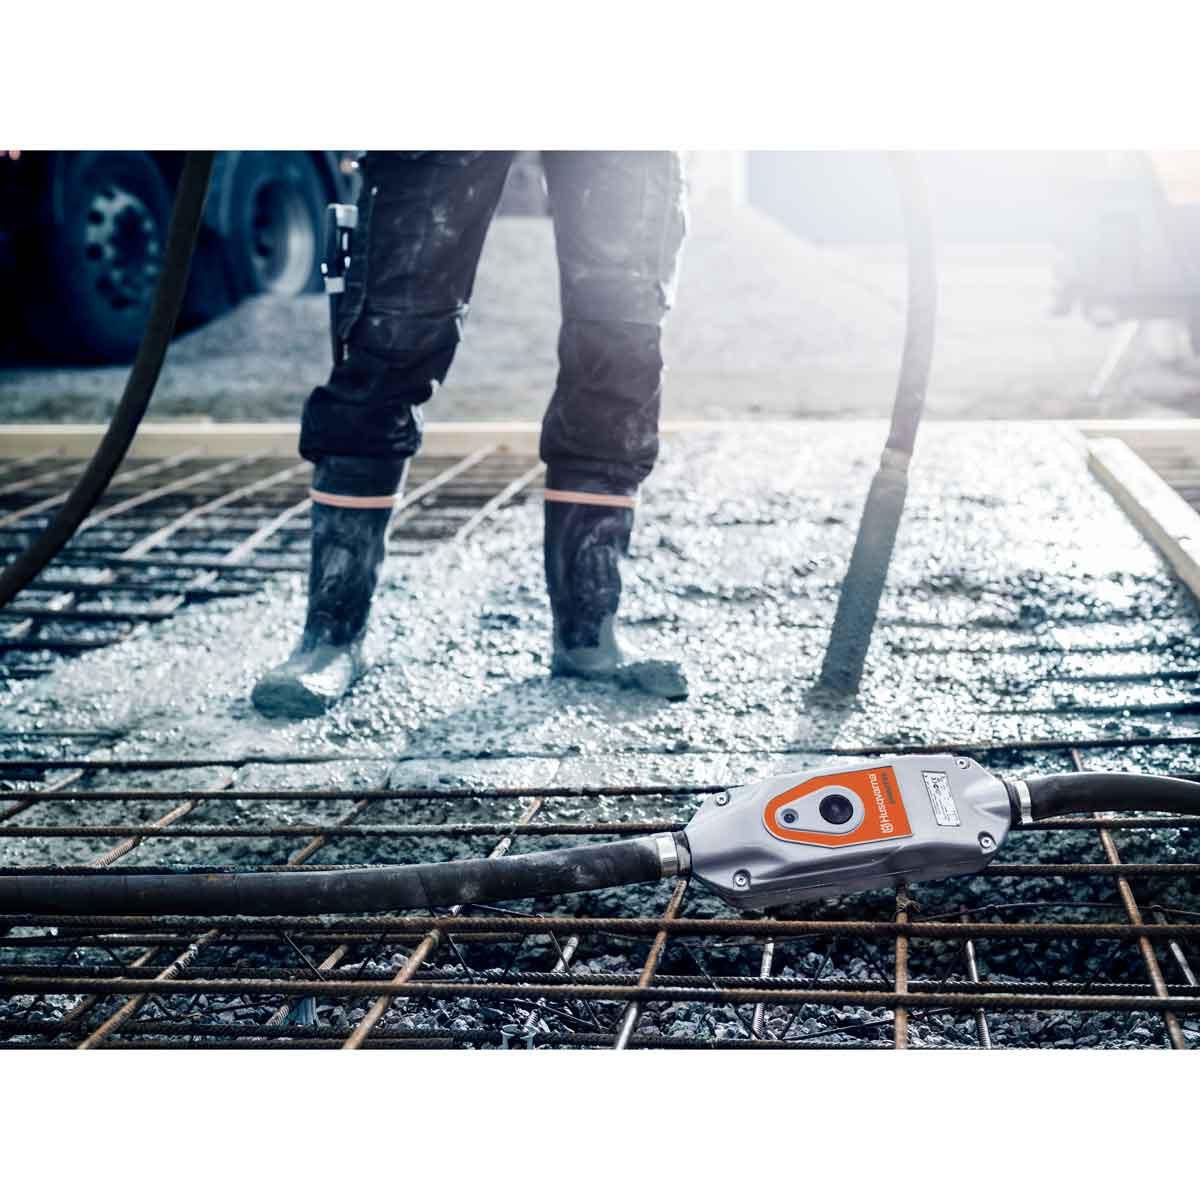 Husqvarna smart concrete vibrators in use on concrete slab